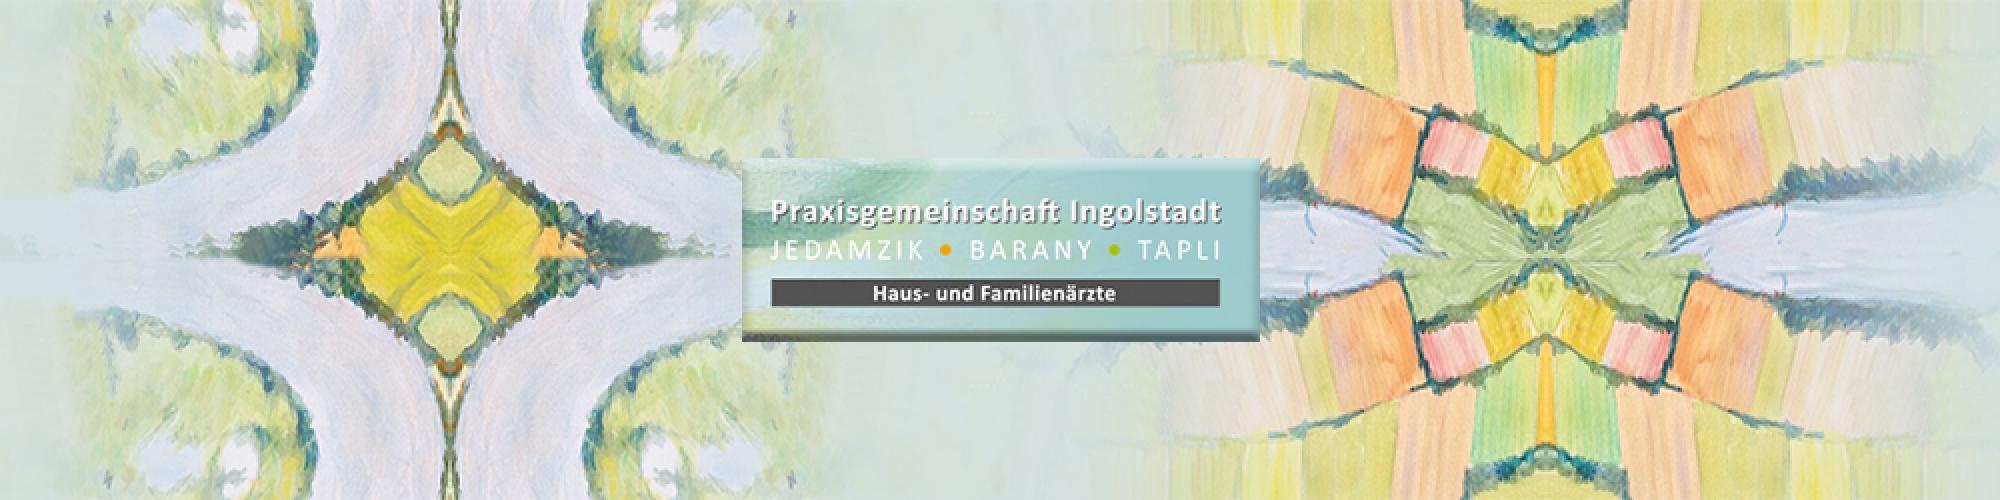 Gesundheitszentrum 4.0 Baar-Ebenhausen